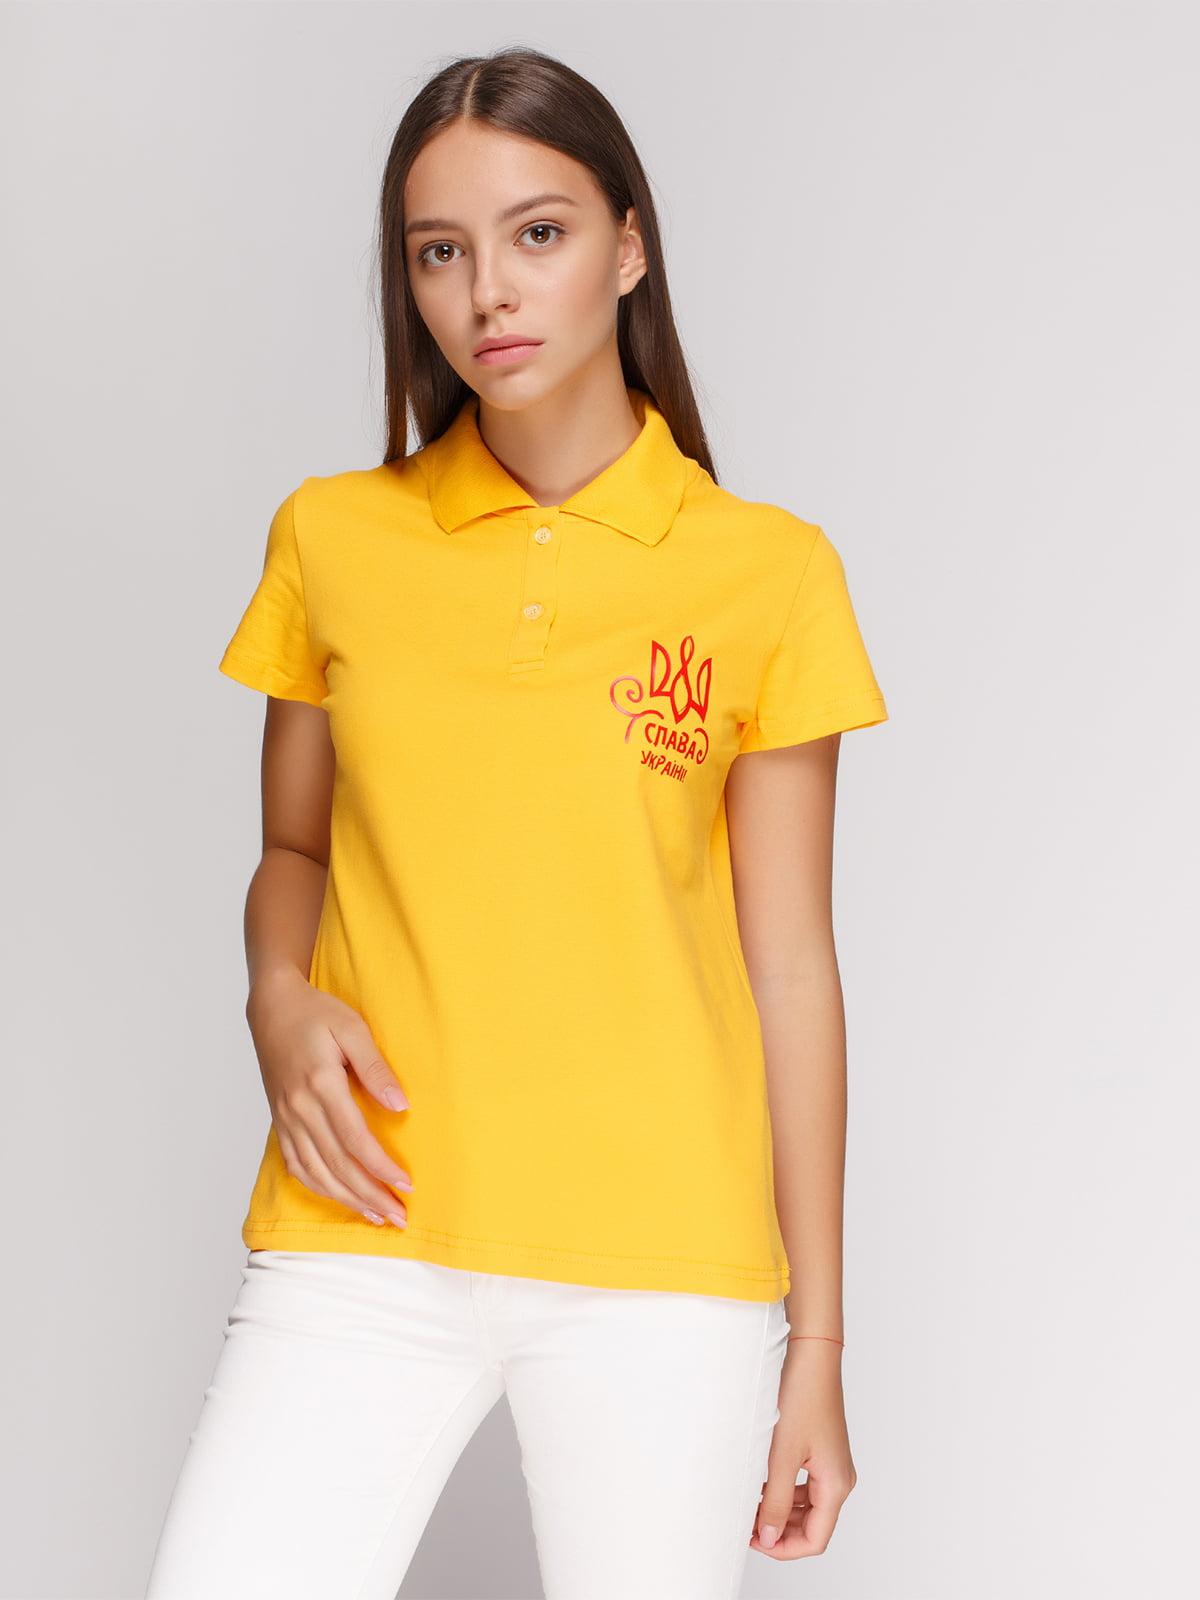 Футболка-поло жовта з принтом | 4578491